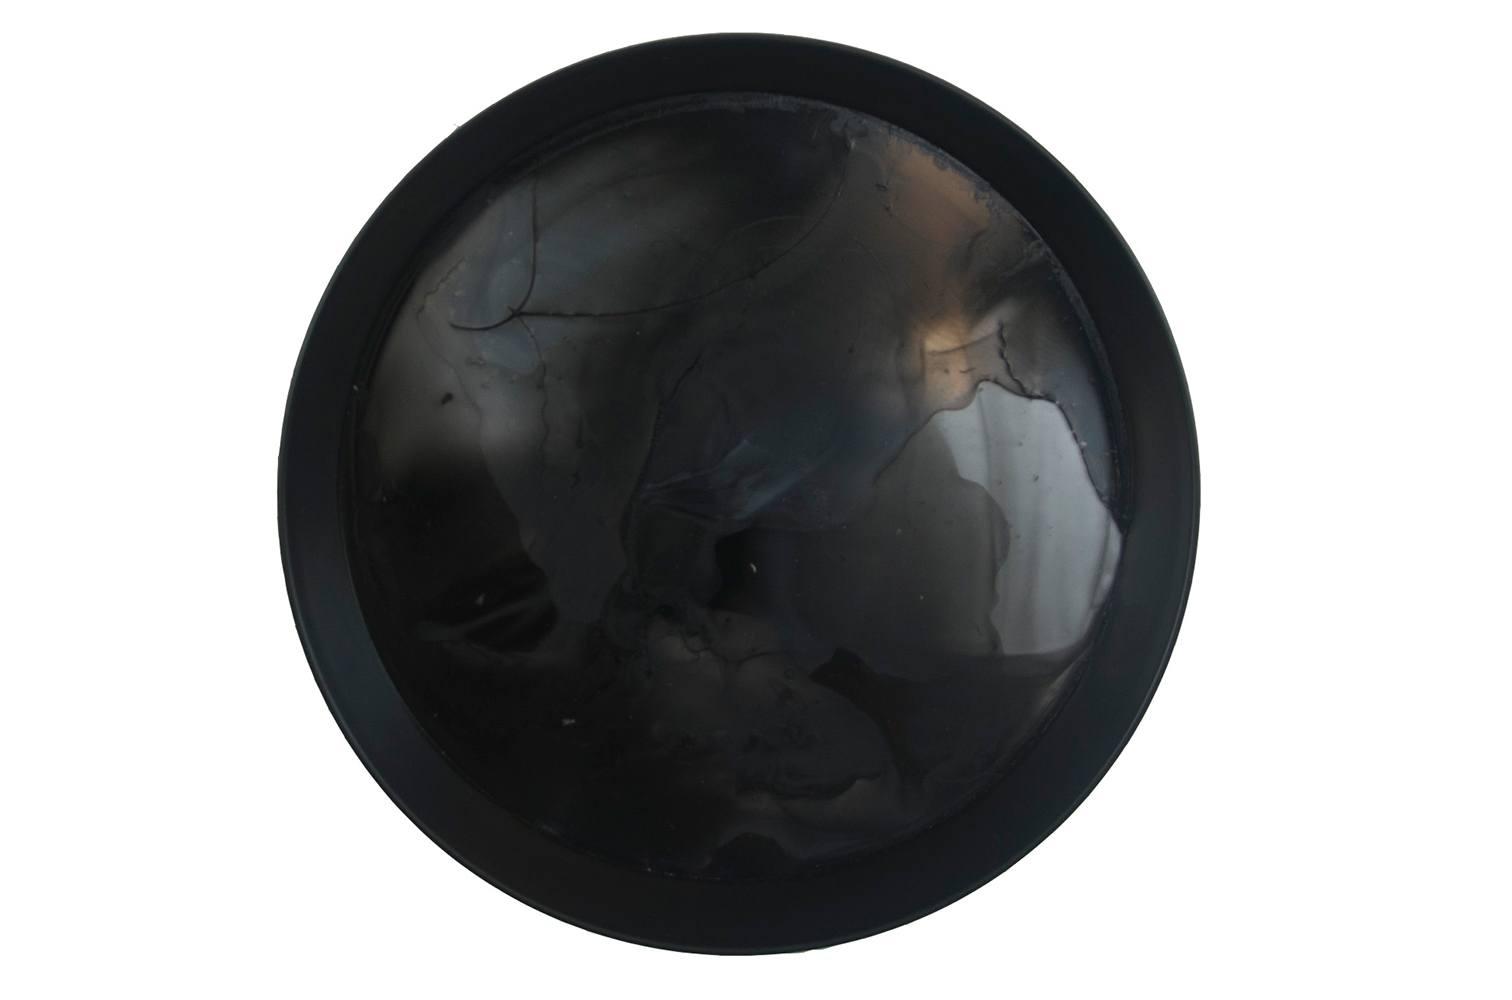 Flattened Sphere #2